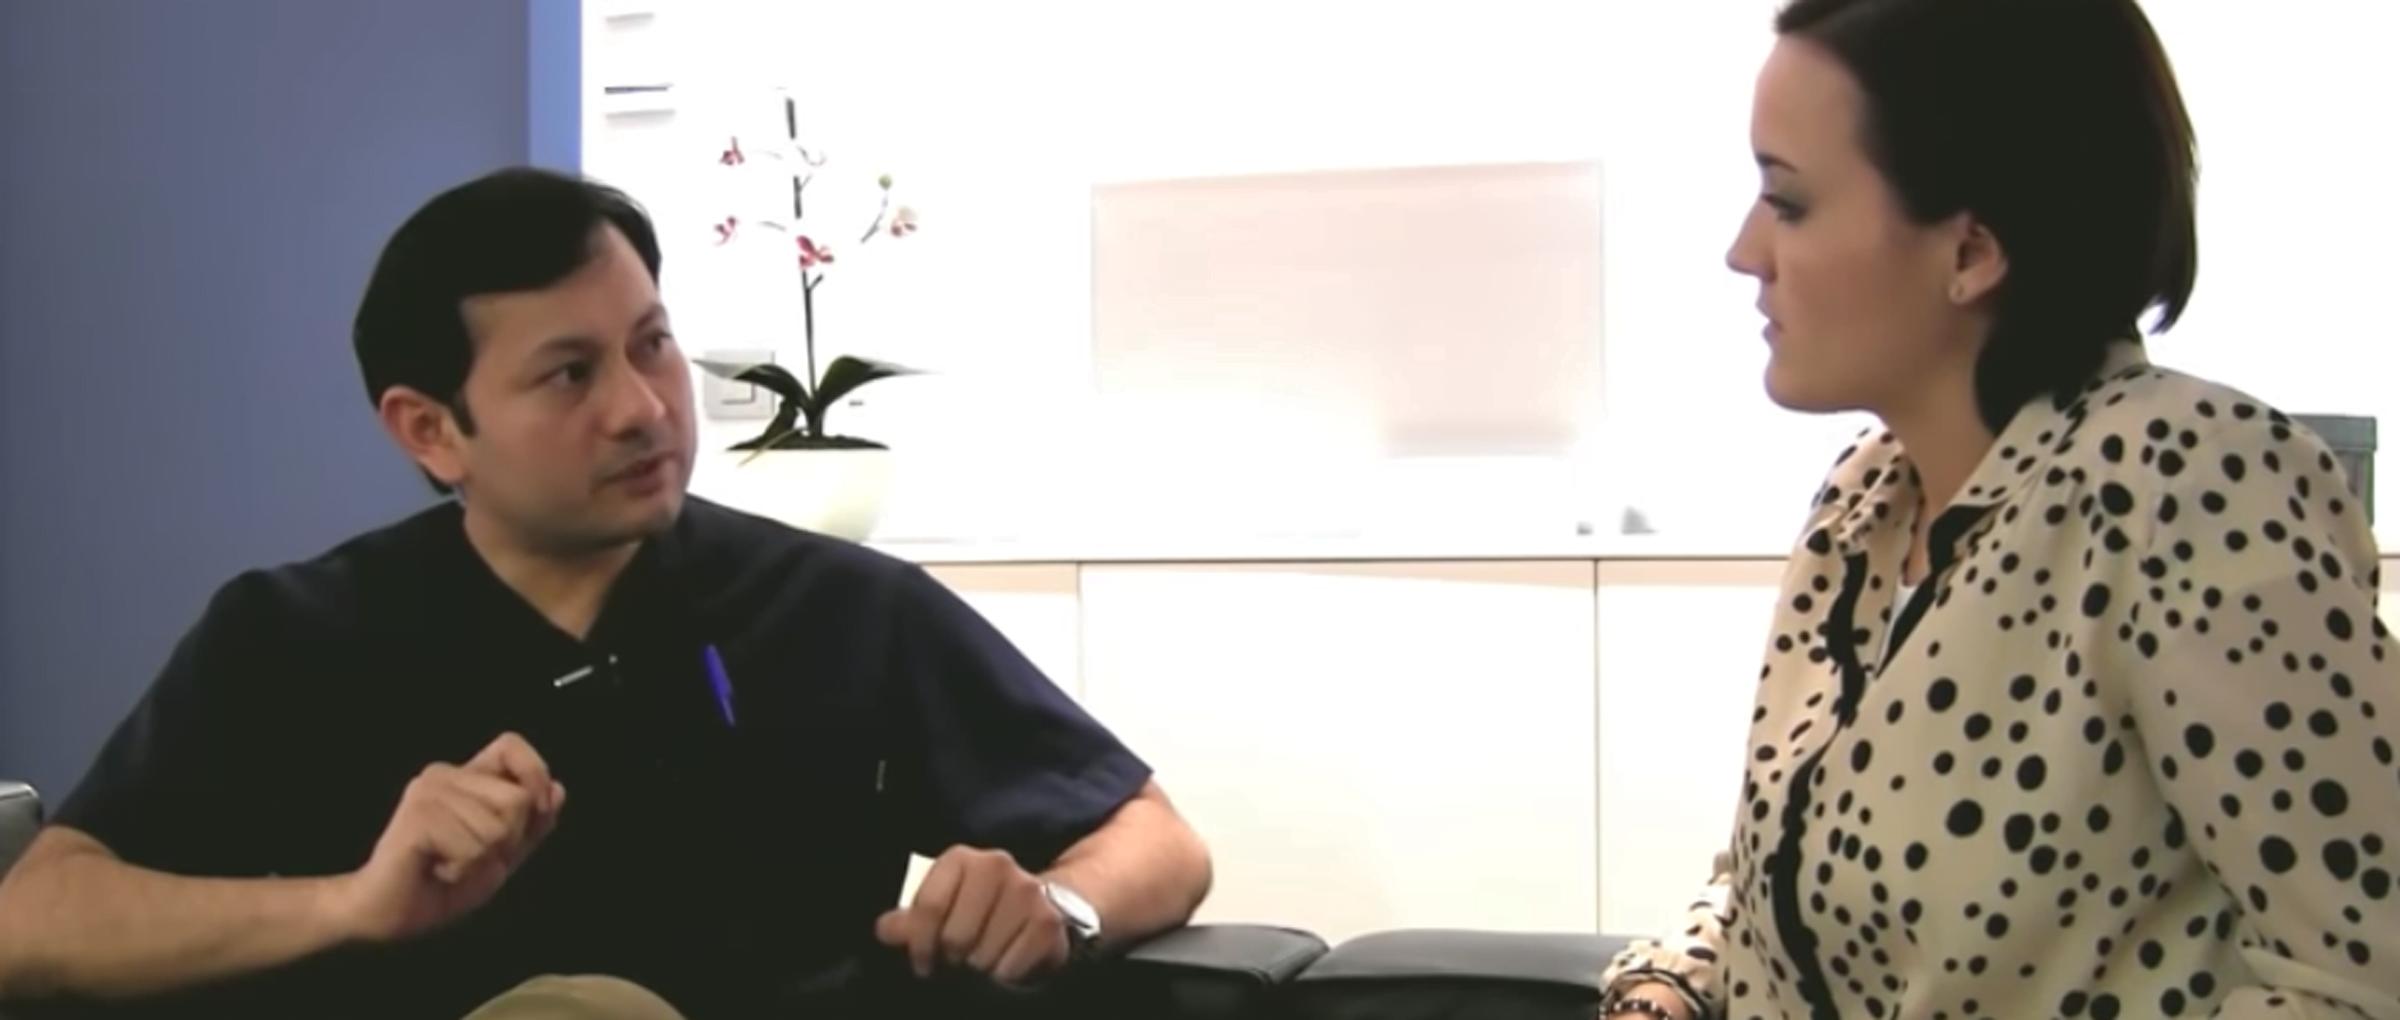 Dr Juan Carlos Castillo about acupuncture and Fertility Treatment